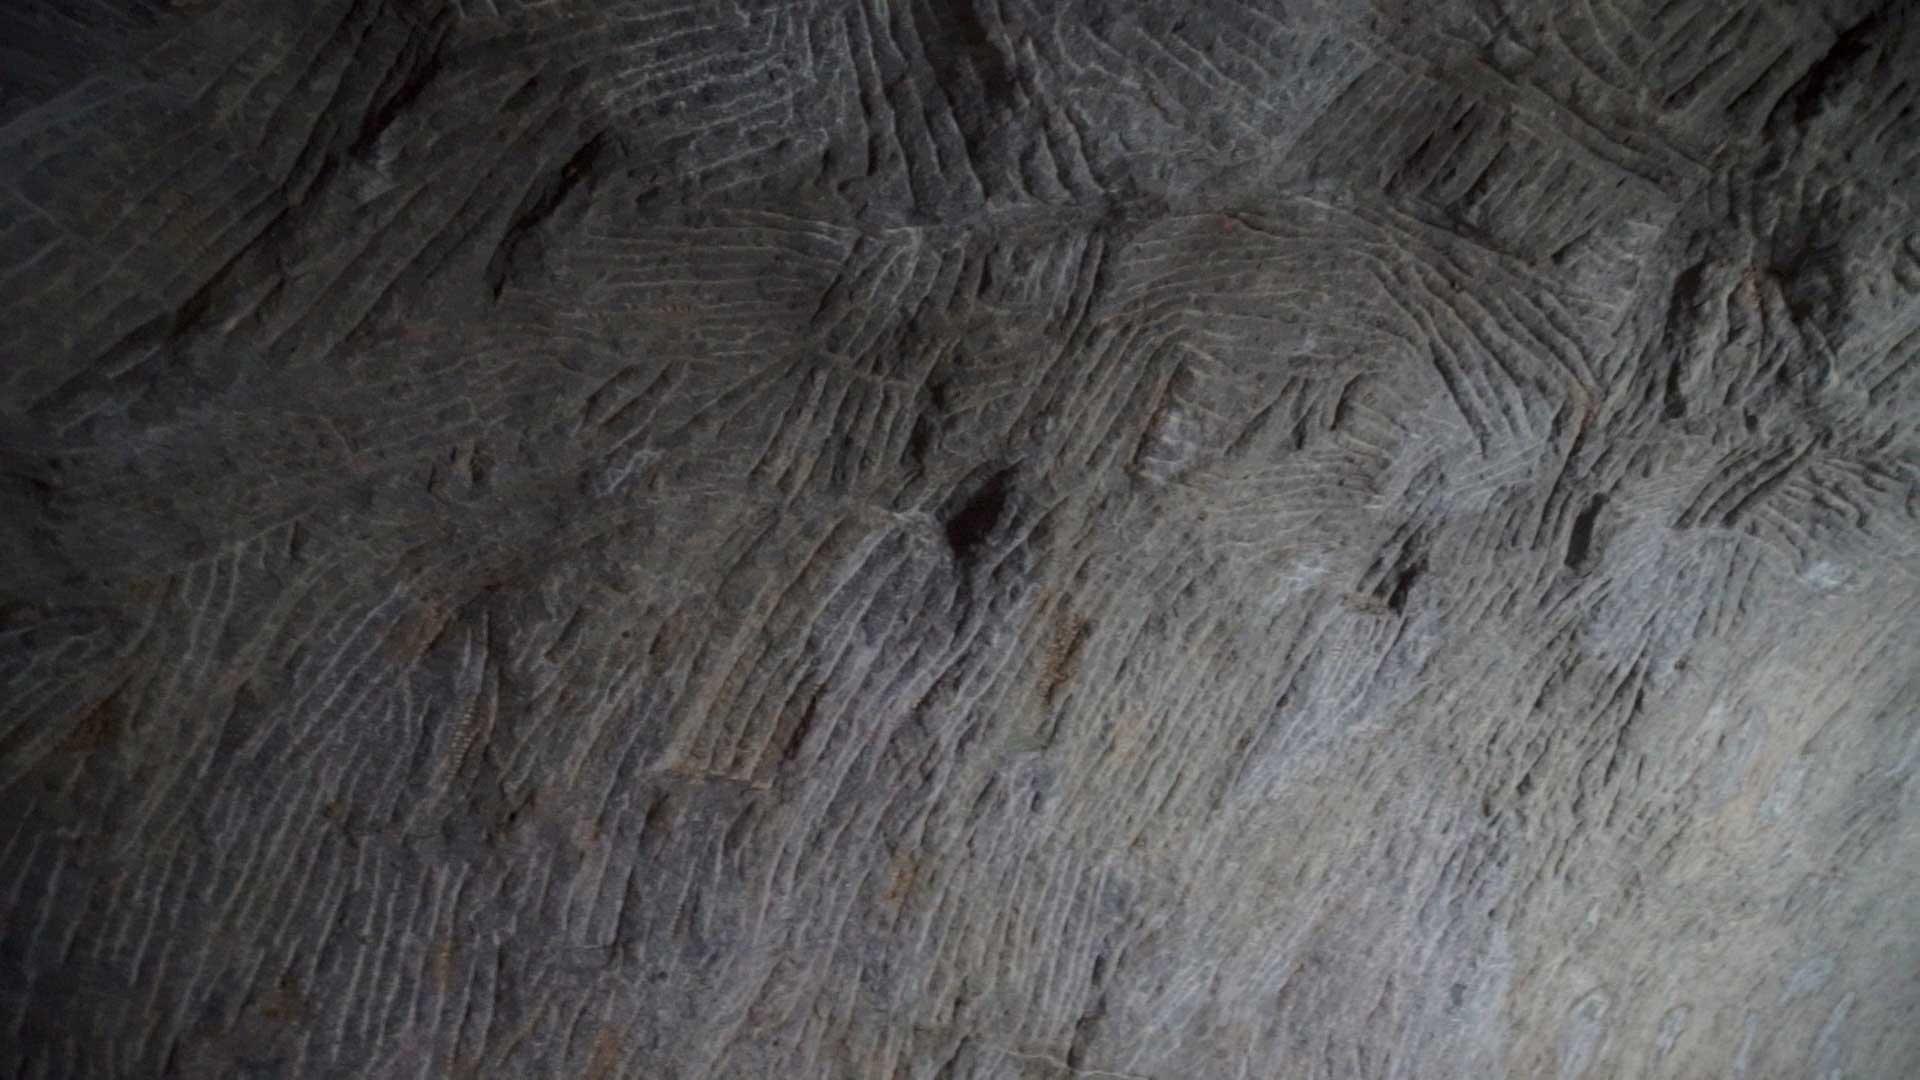 Barabar-BAM-film-granit-miroir-pyramide-inde-yoga-archeologie-06